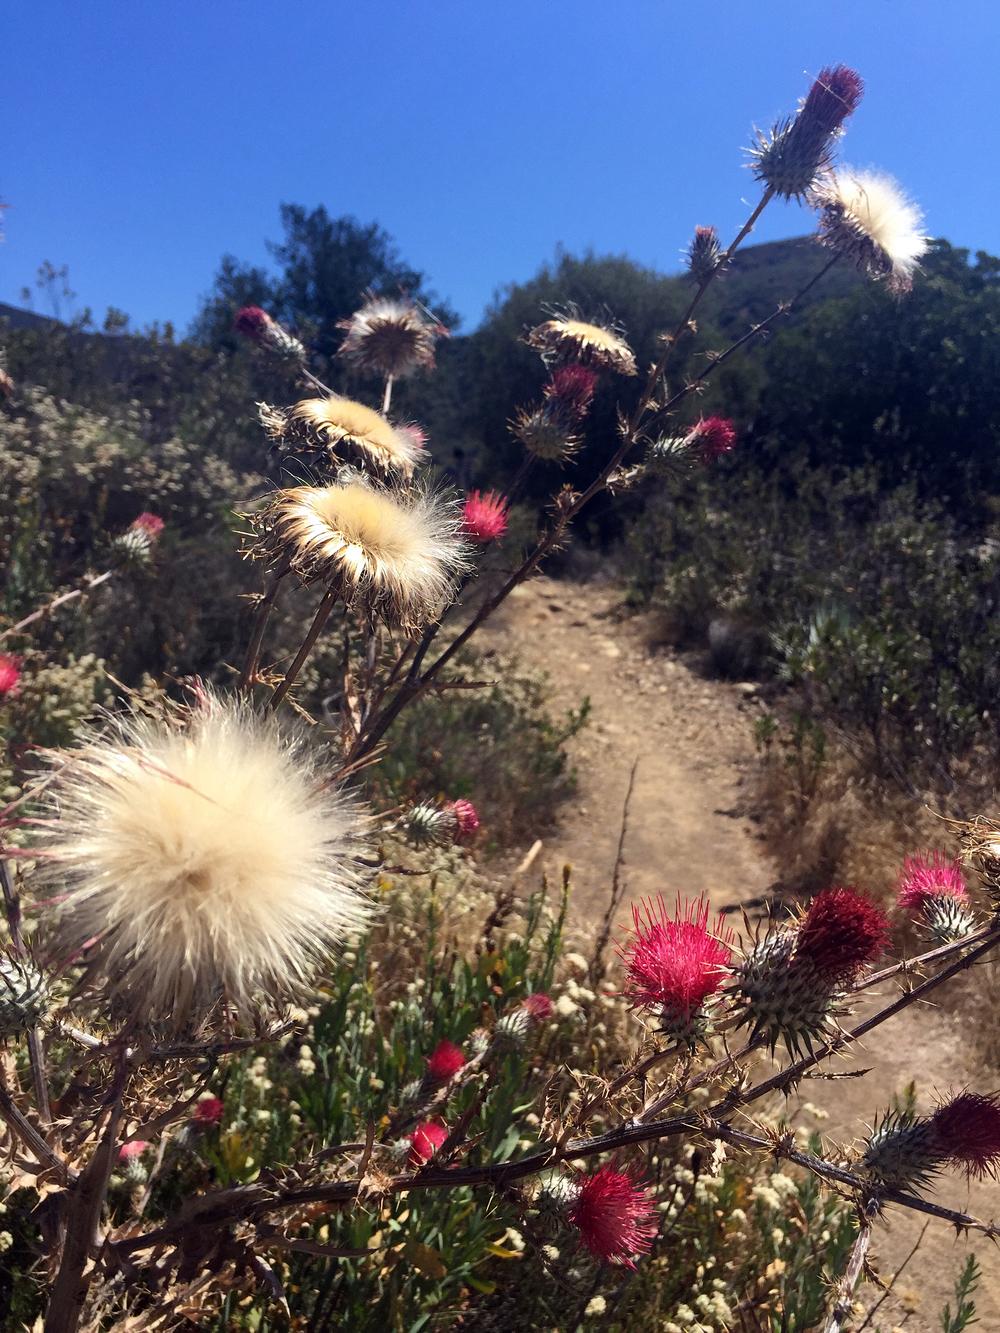 Flowers in Matilija Canyon in Ojai, CA